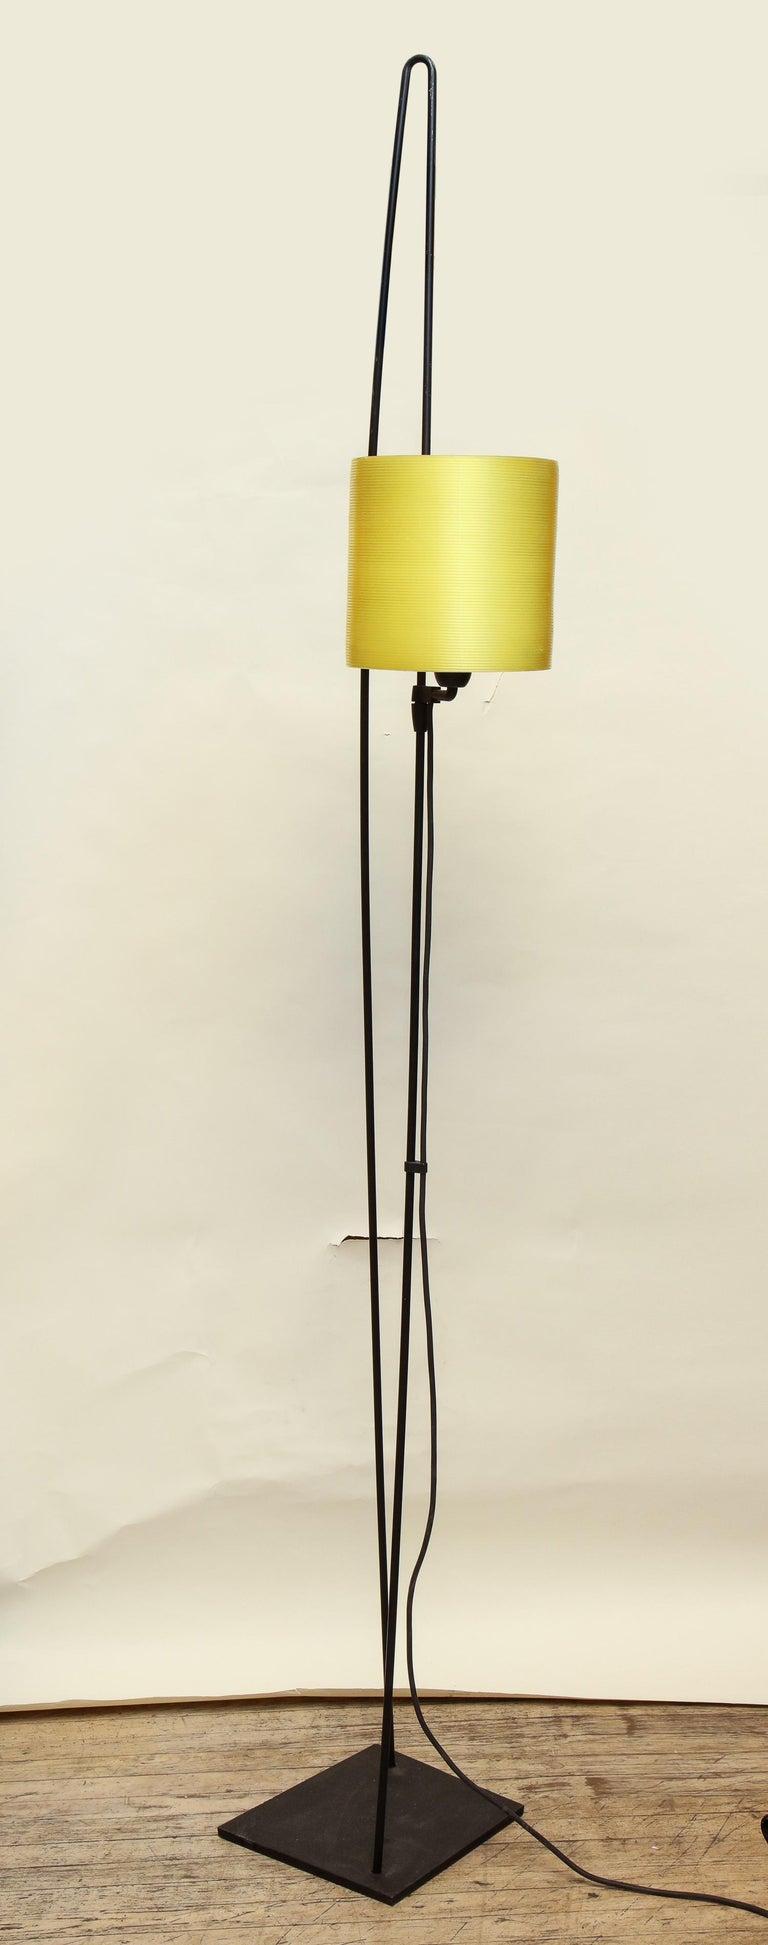 Italiana Luce Floor Lamp Mid-Century Modern Ion and Plexiglass, Italy, 1970 For Sale 11